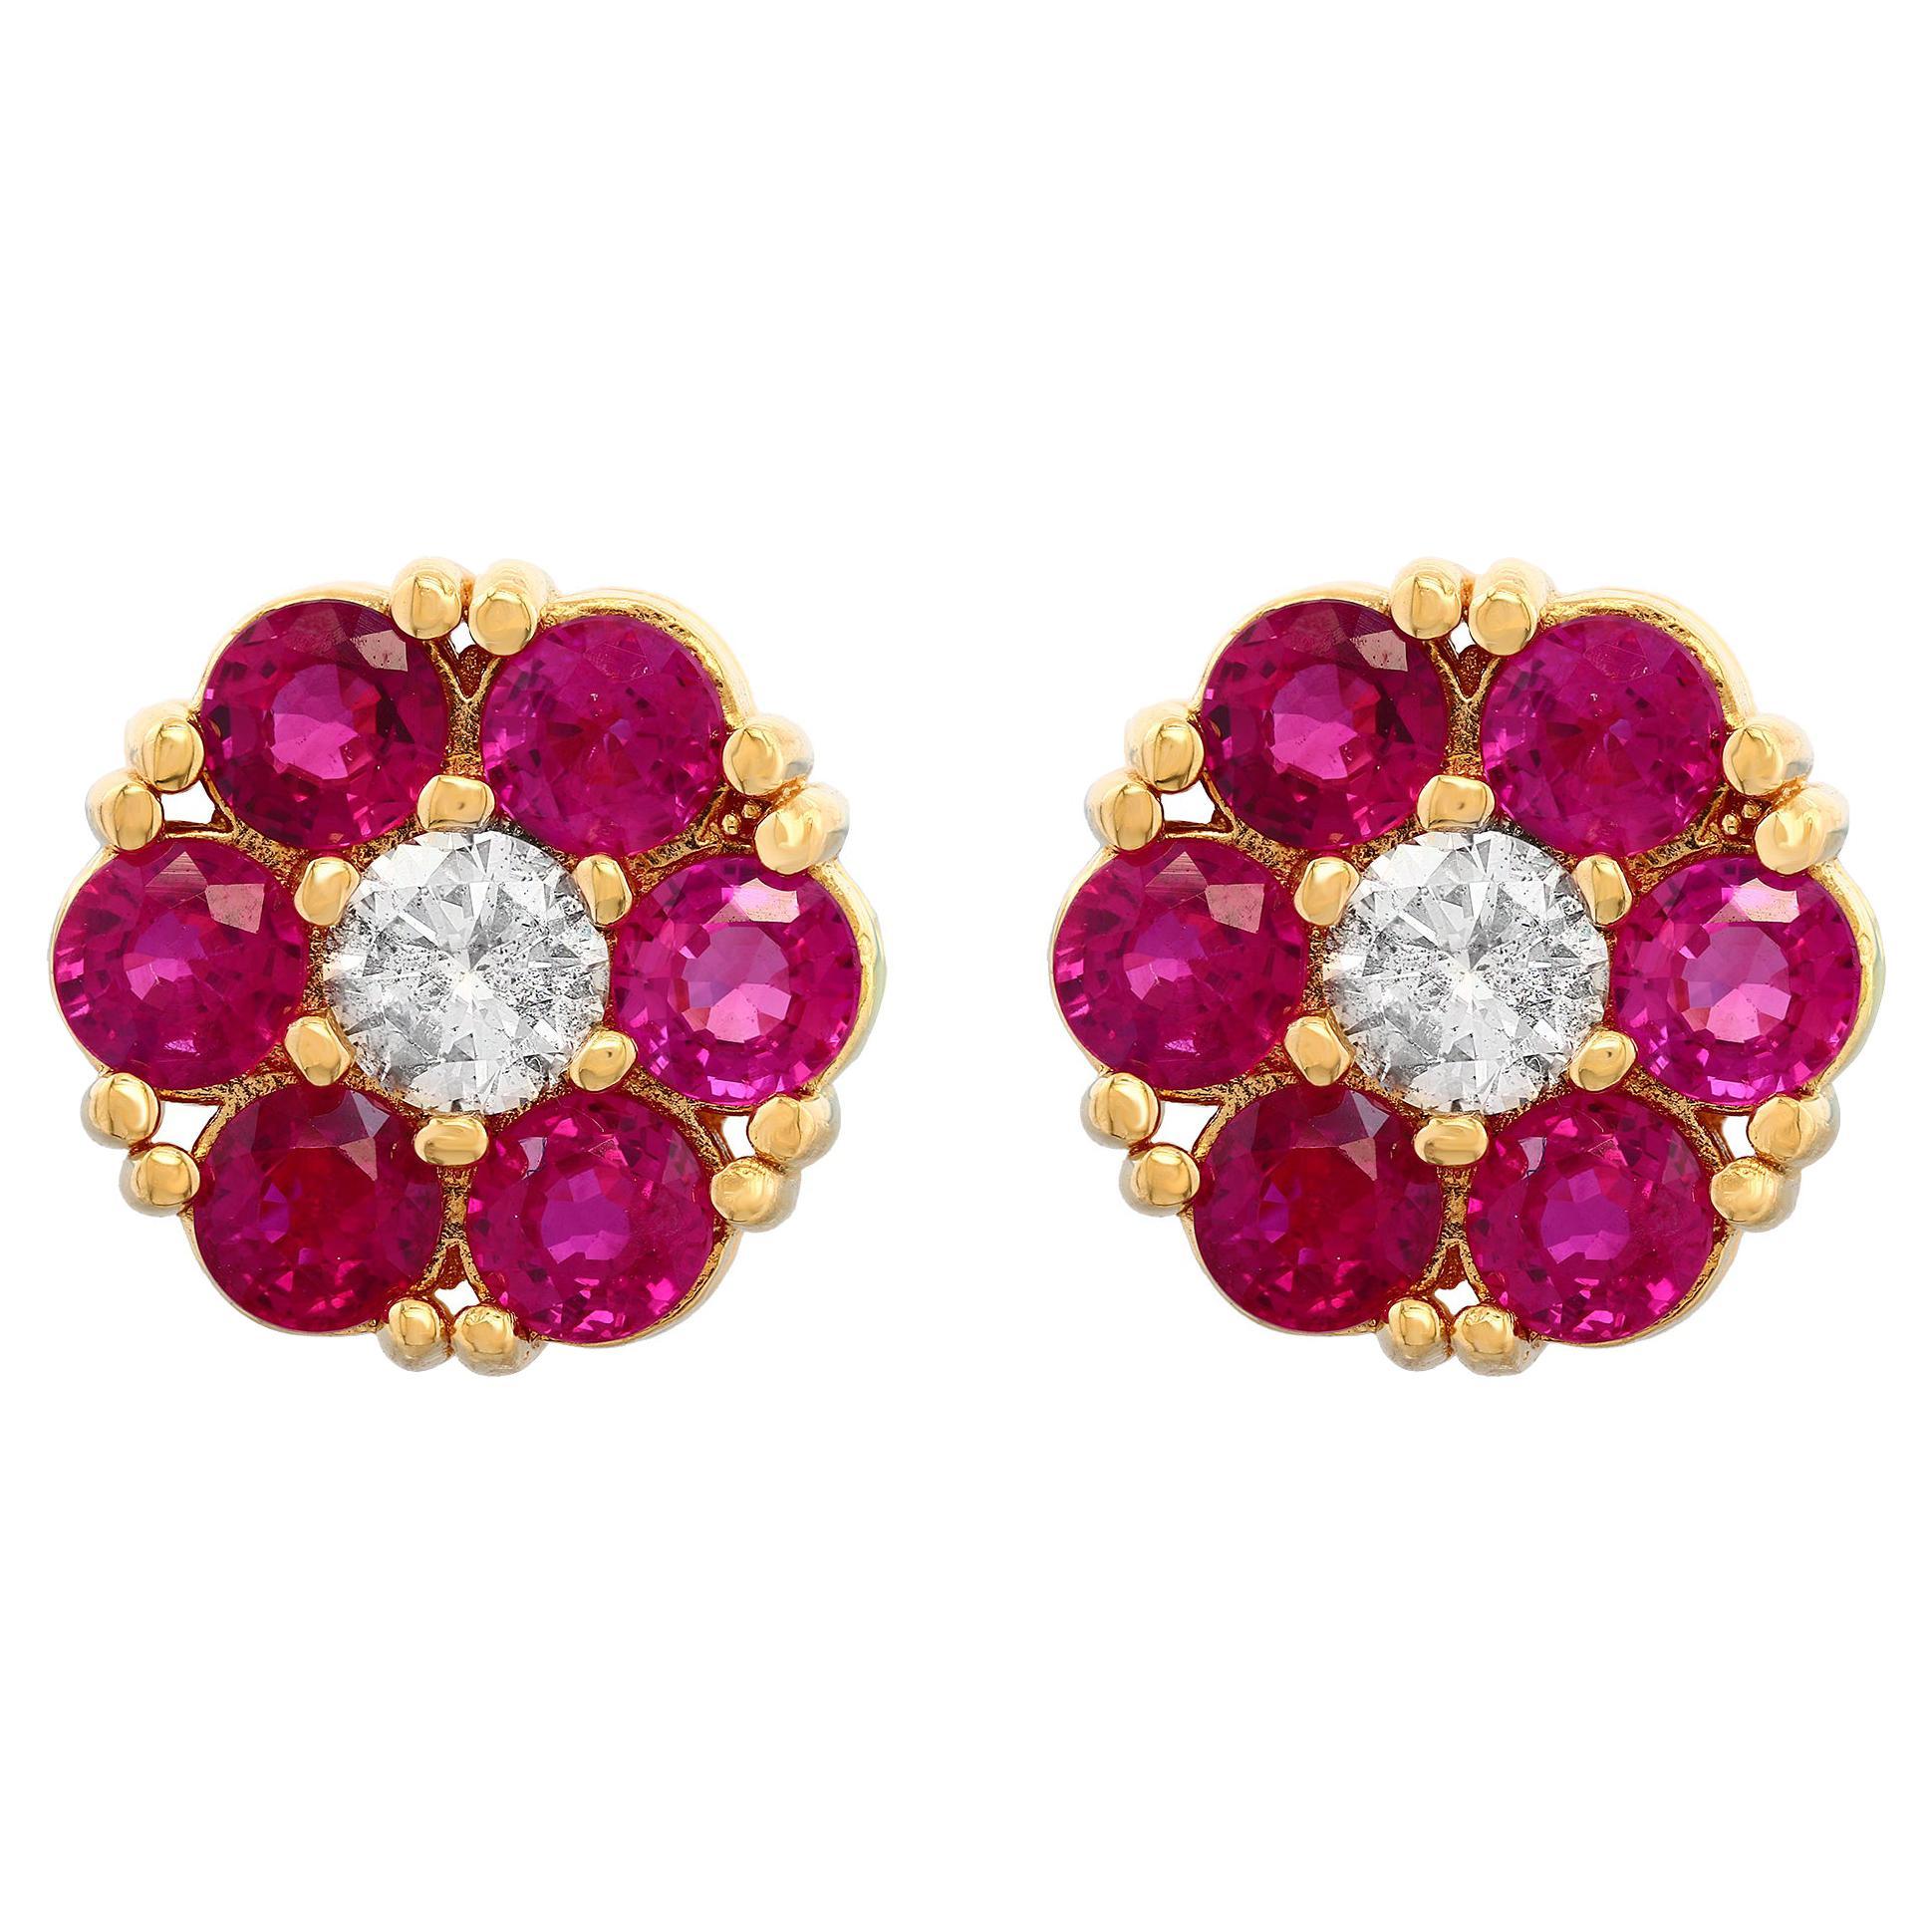 3 Carat Ruby & Diamond Floral Cluster Flower Stud Earrings 14 Karat Yellow Gold